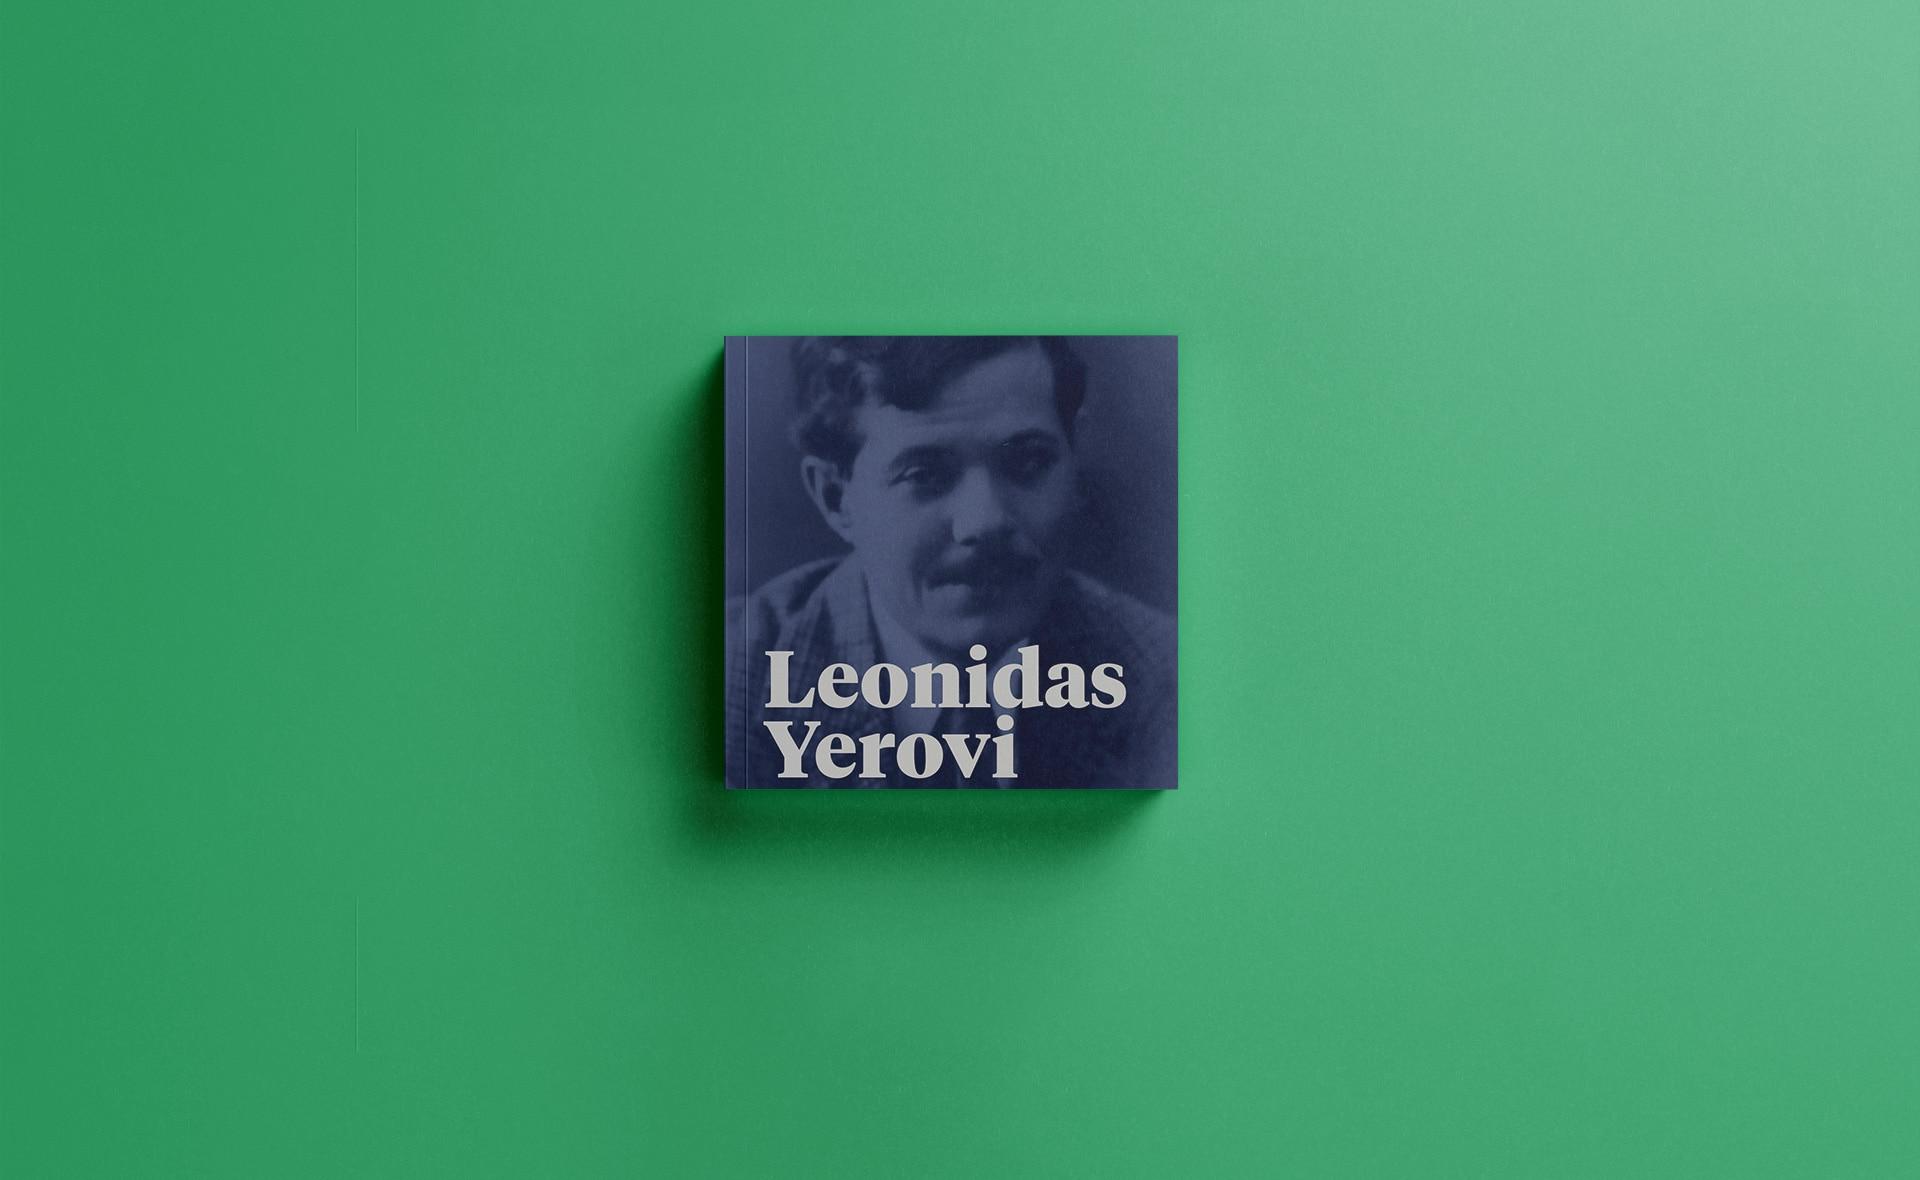 BBVA-leonidas-yerovi-apertura-bbva-podcast-peru-poemas